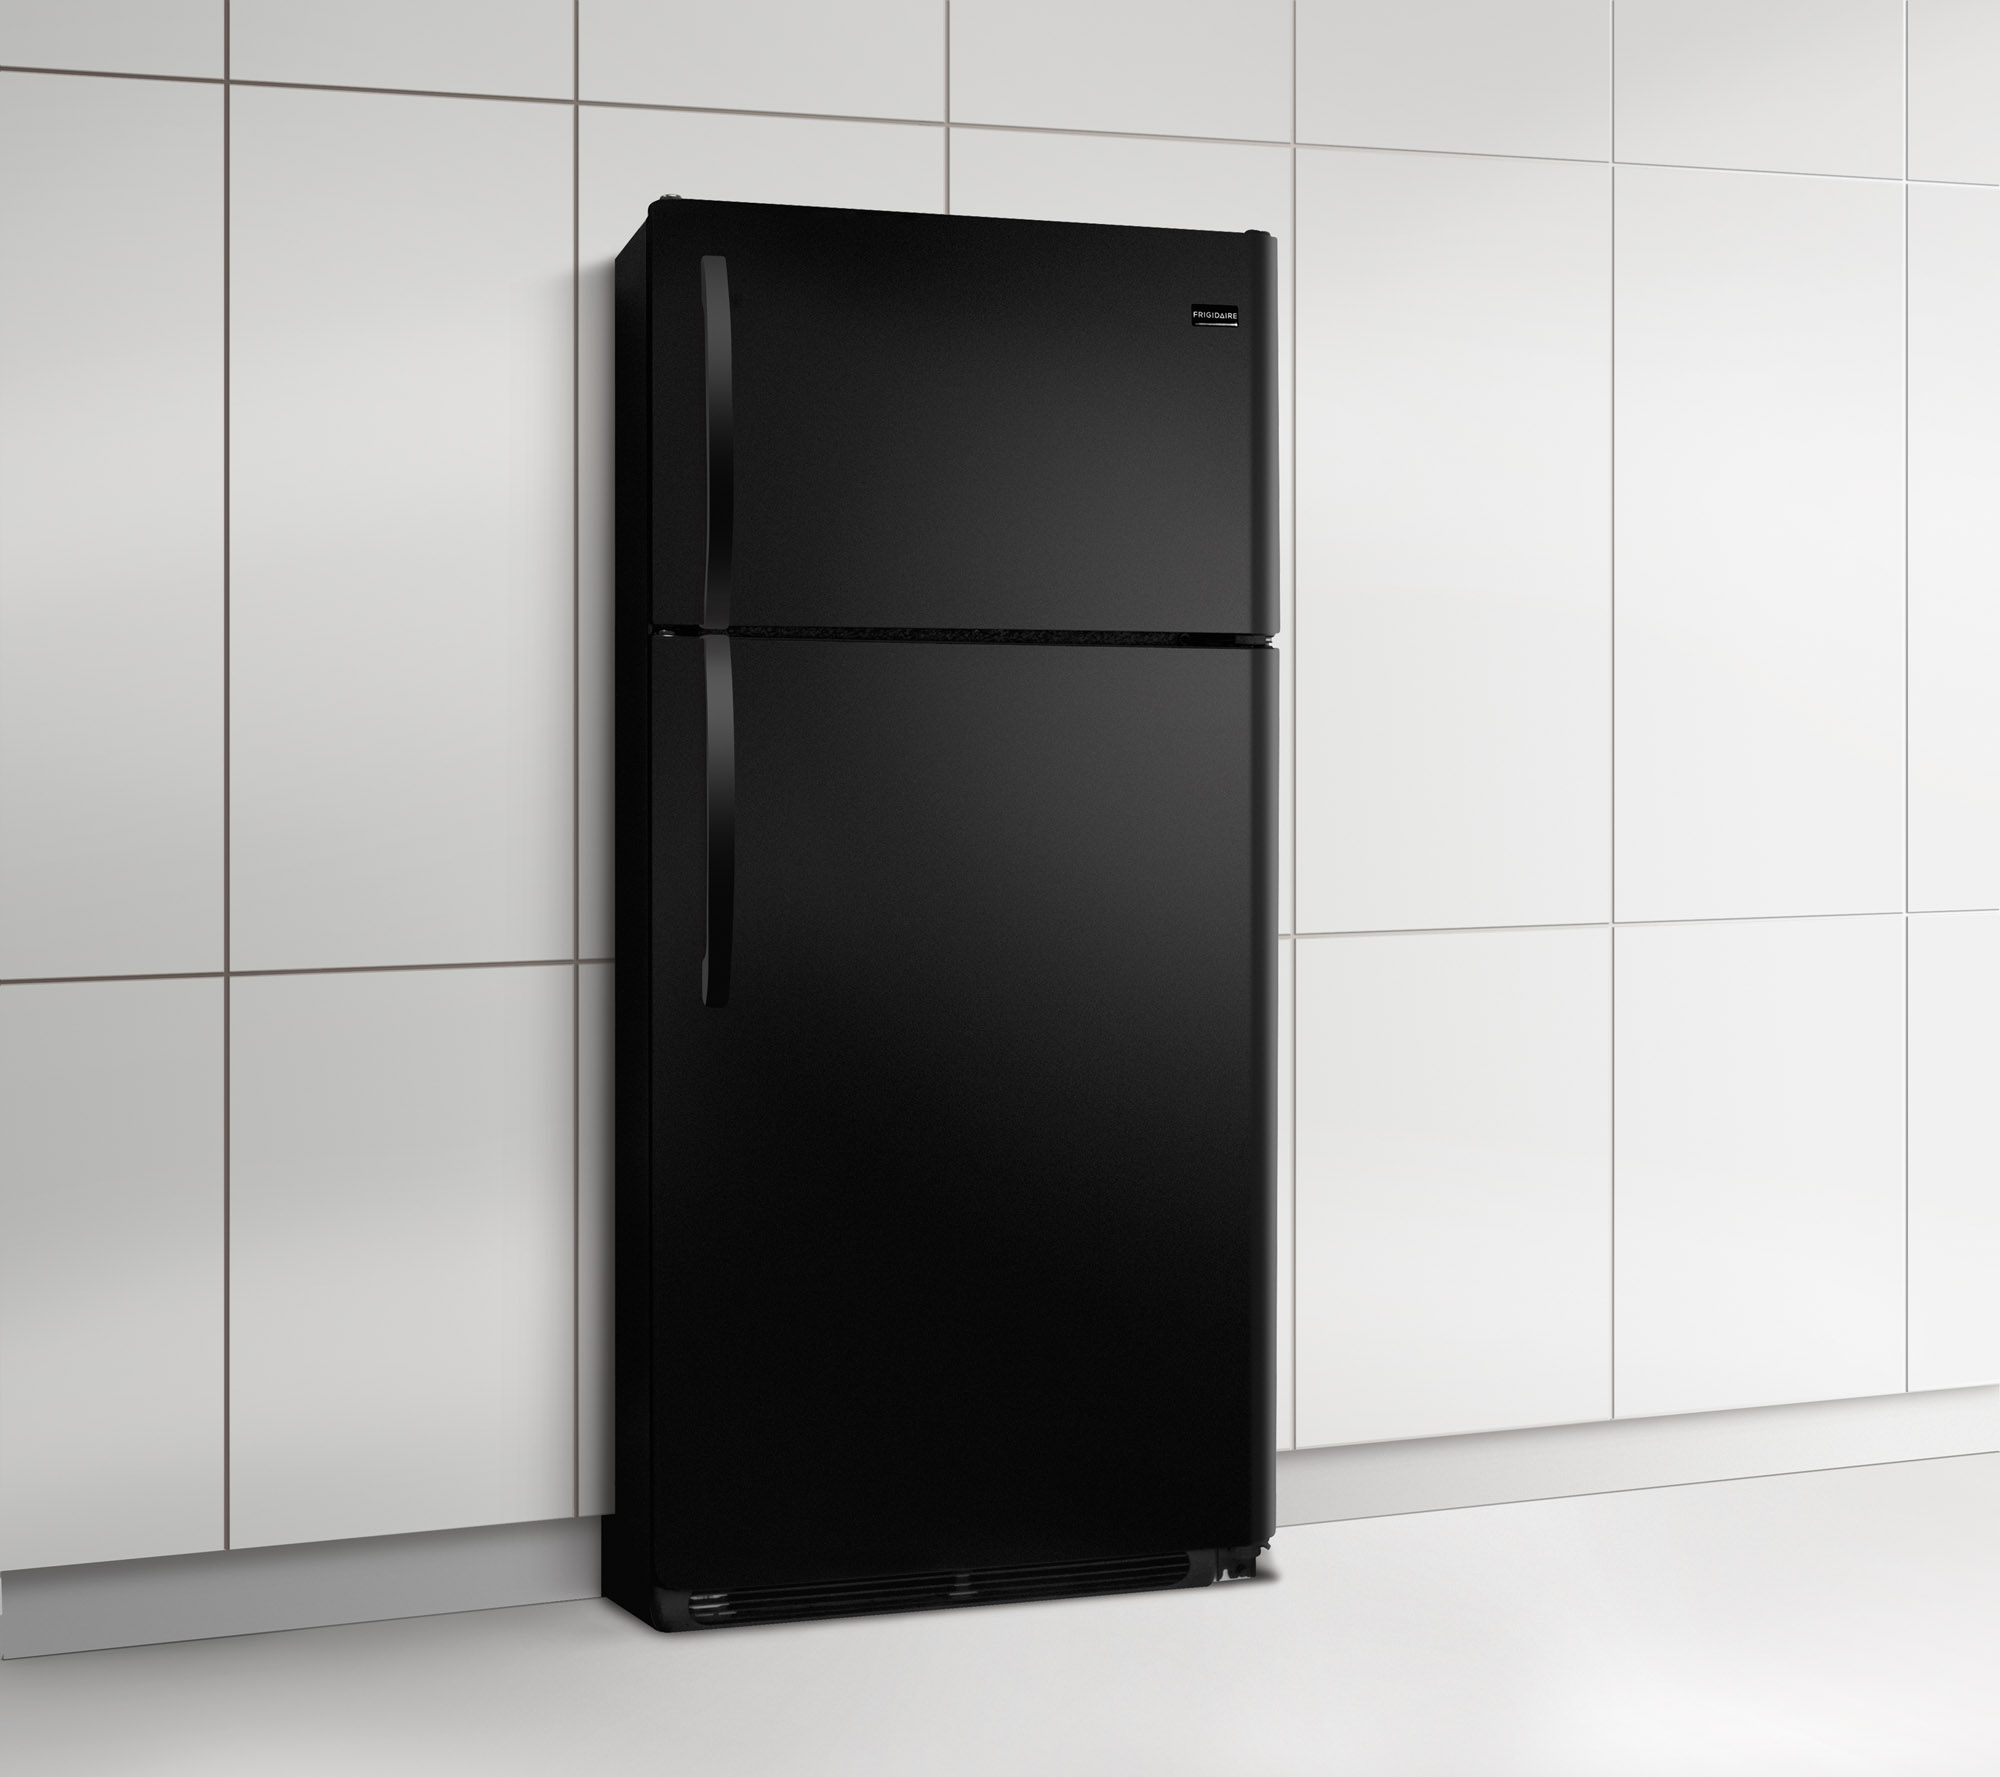 Frigidaire FFHT1614QB 16.3 cu. ft. Top-Mount Refrigerator - Black